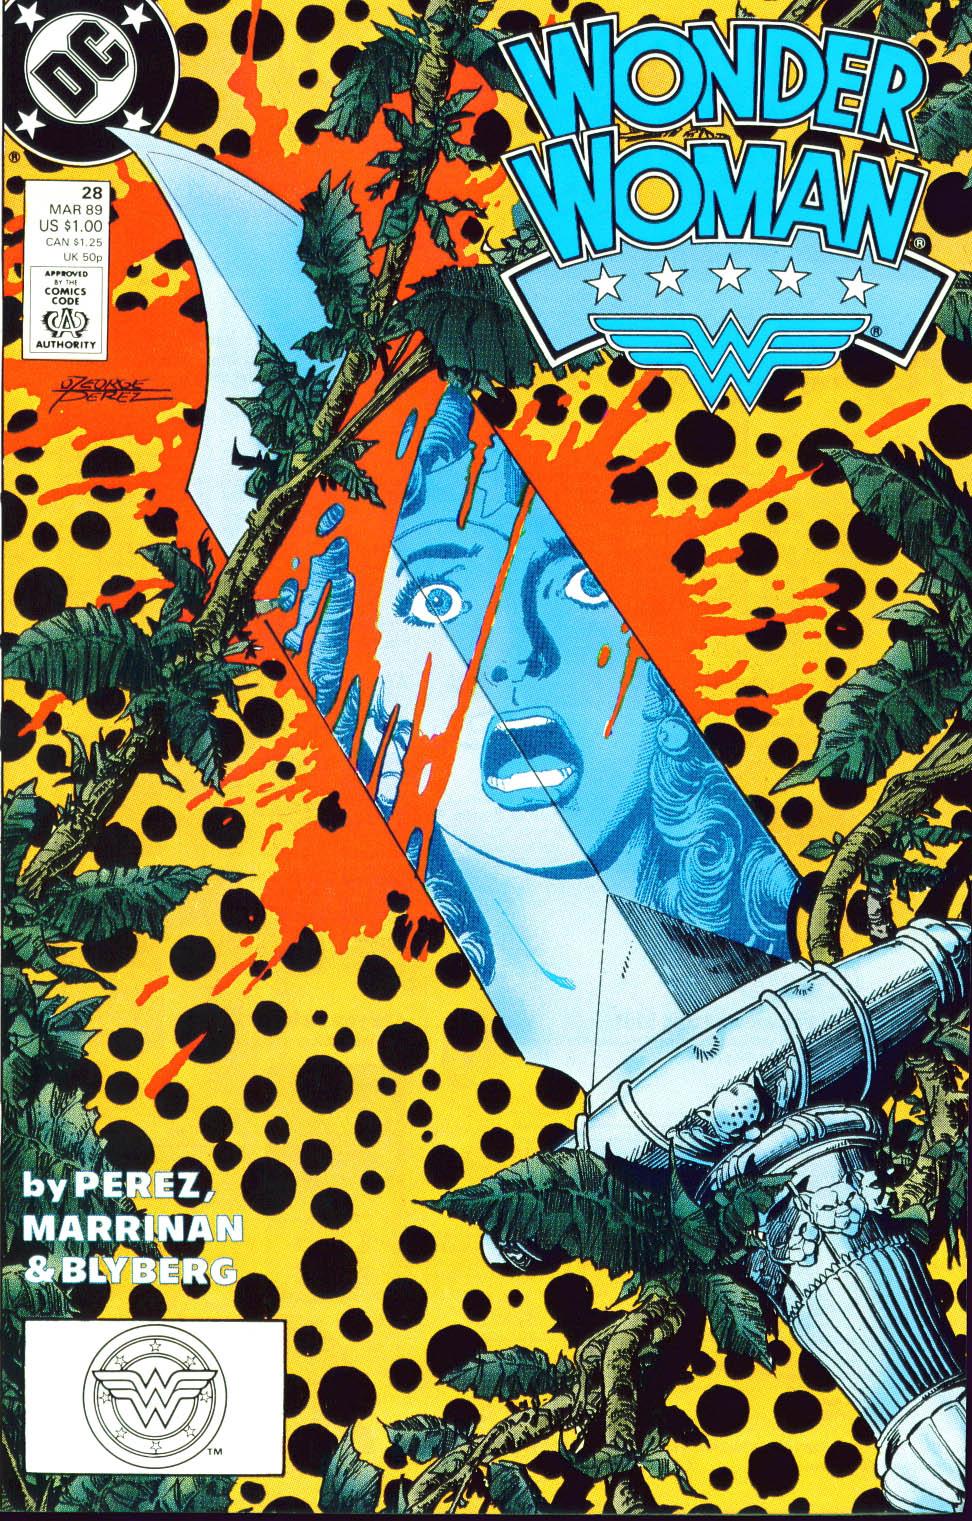 Read online Wonder Woman (1987) comic -  Issue #28 - 2